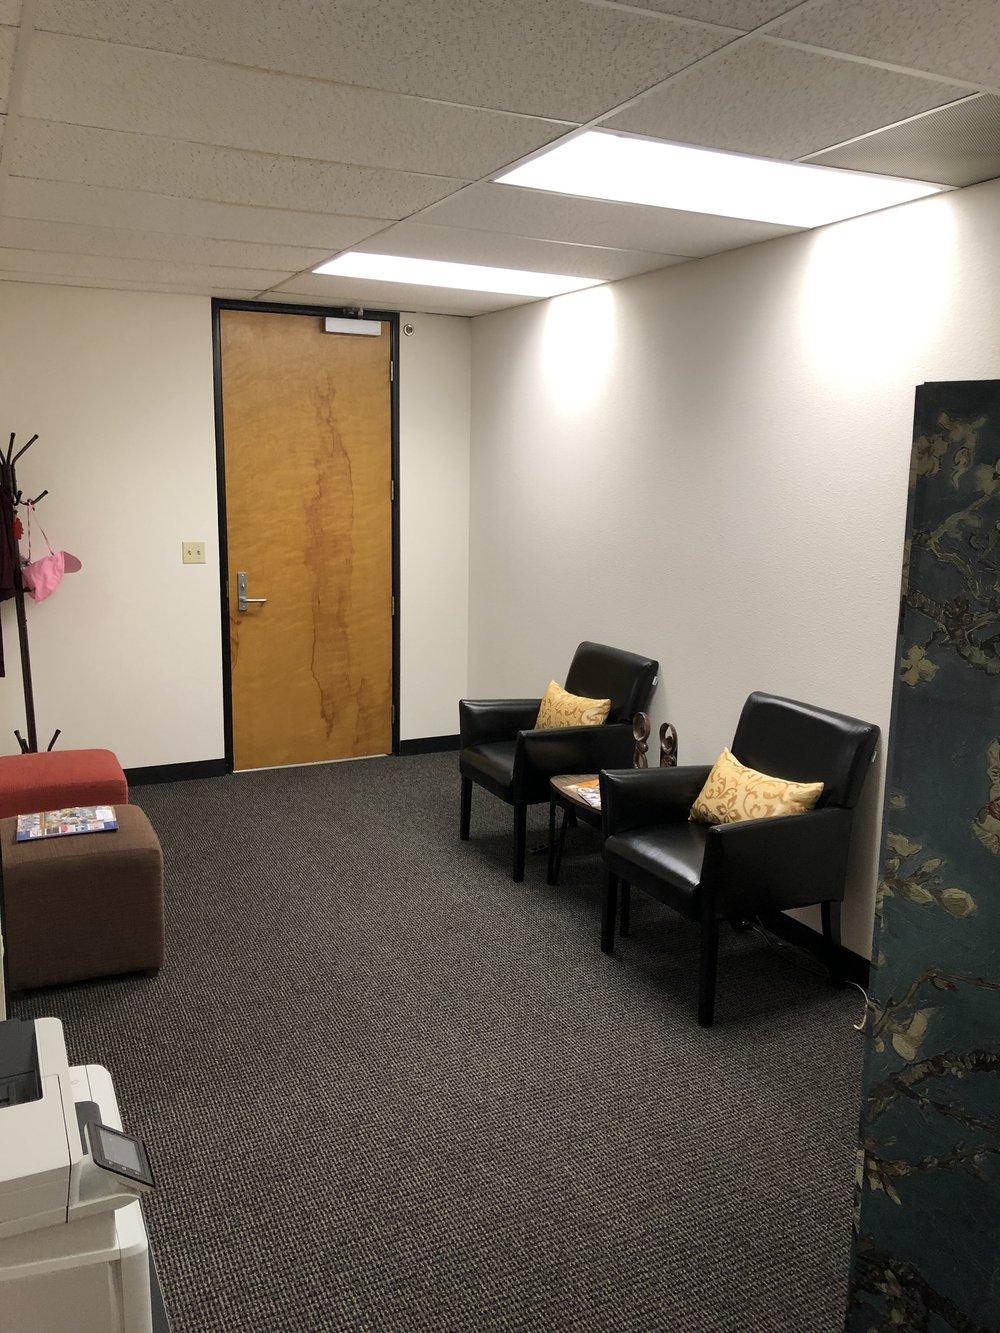 New reception area - Dr. Saori's Office